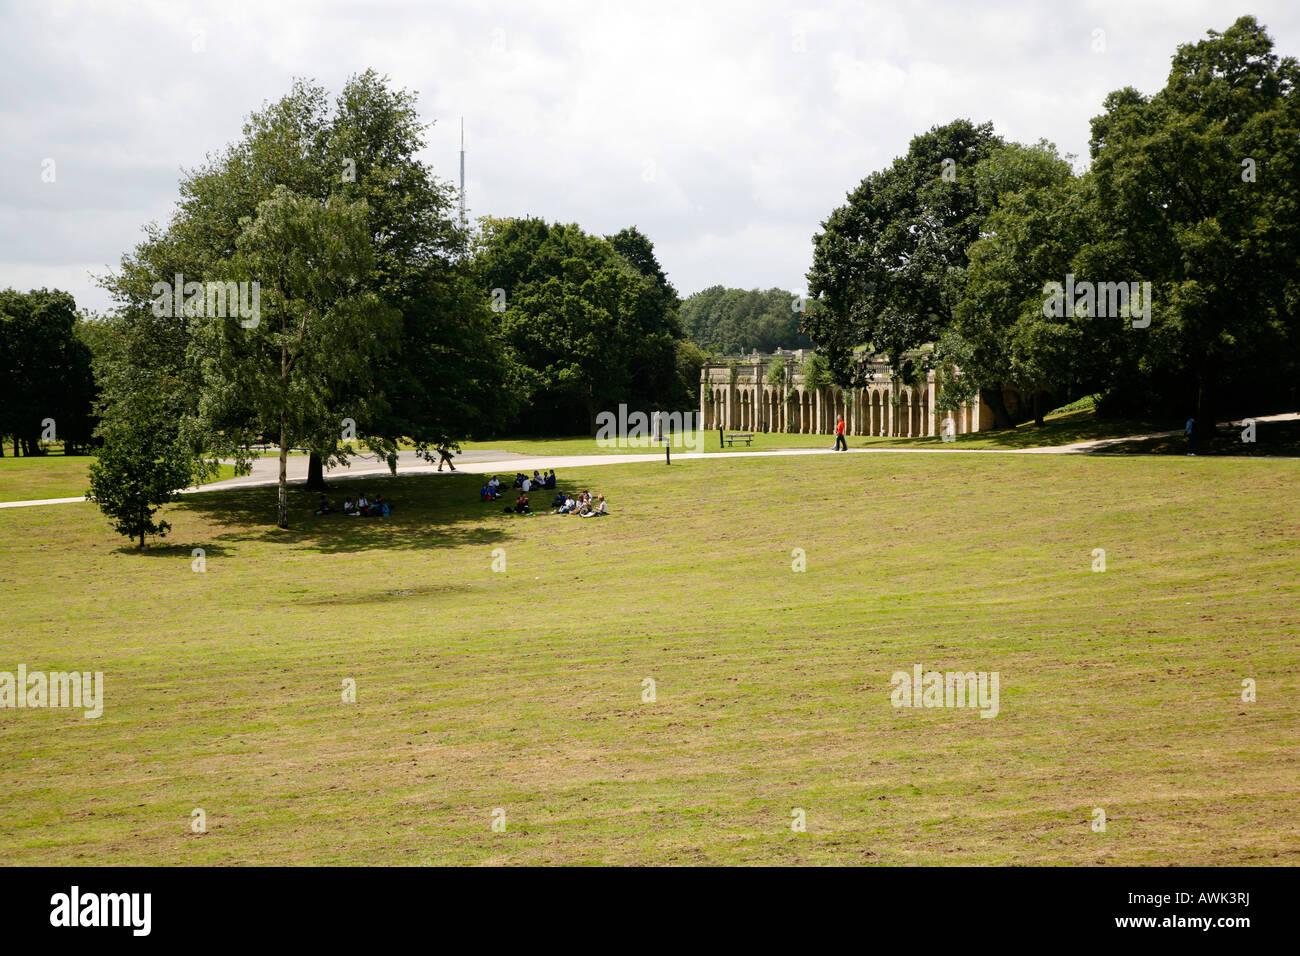 Crystal Palace Park in Sydenham, London - Stock Image